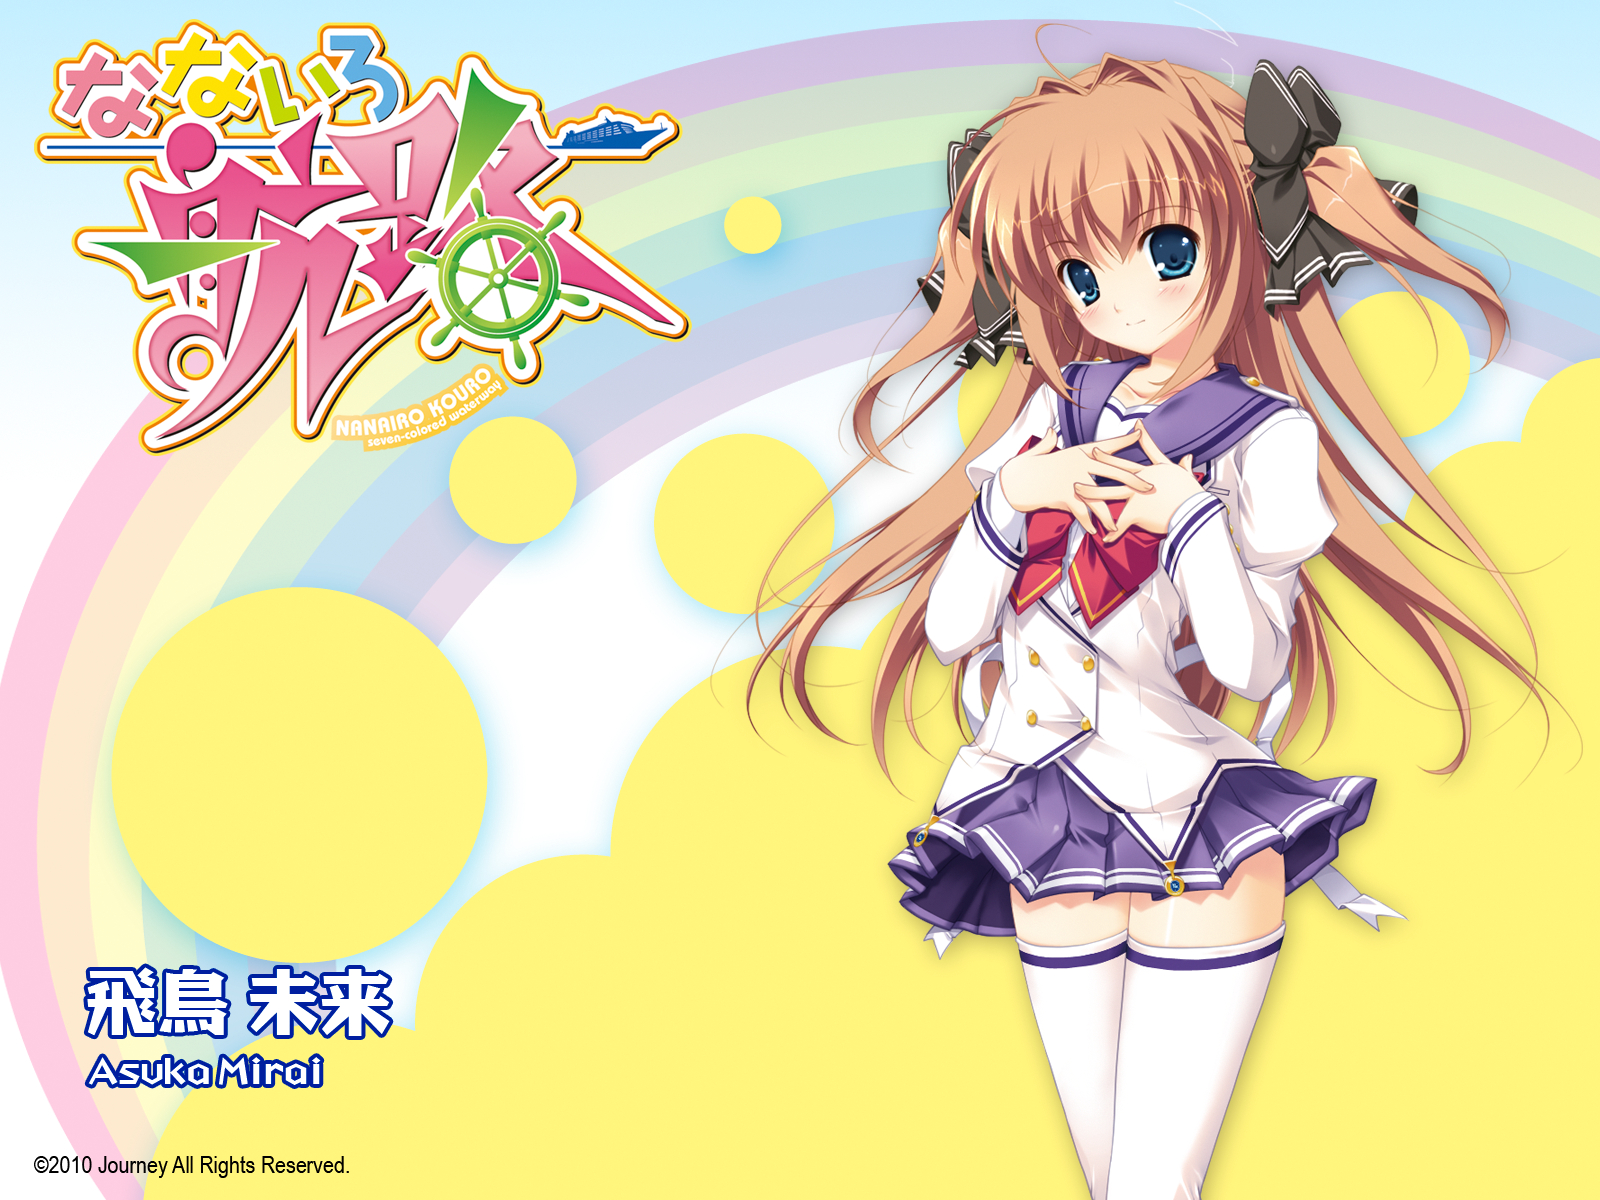 asuka_mirai blue_eyes bow brown_hair journey long_hair mikeou nanairo_kouro ribbons school_uniform thighhighs